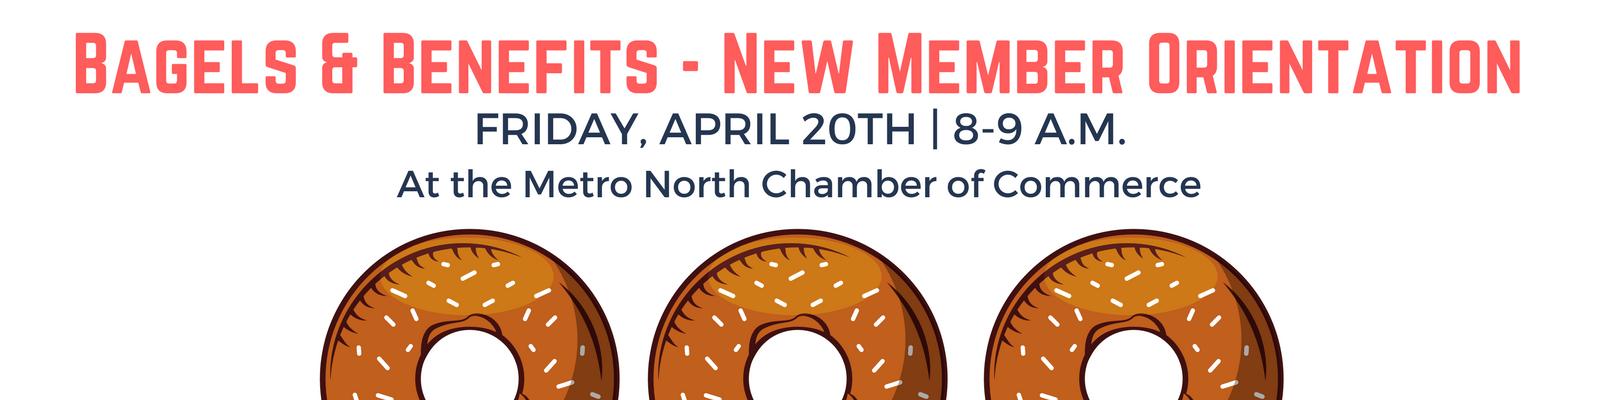 New-member-orient-april-2018-web-banner.png